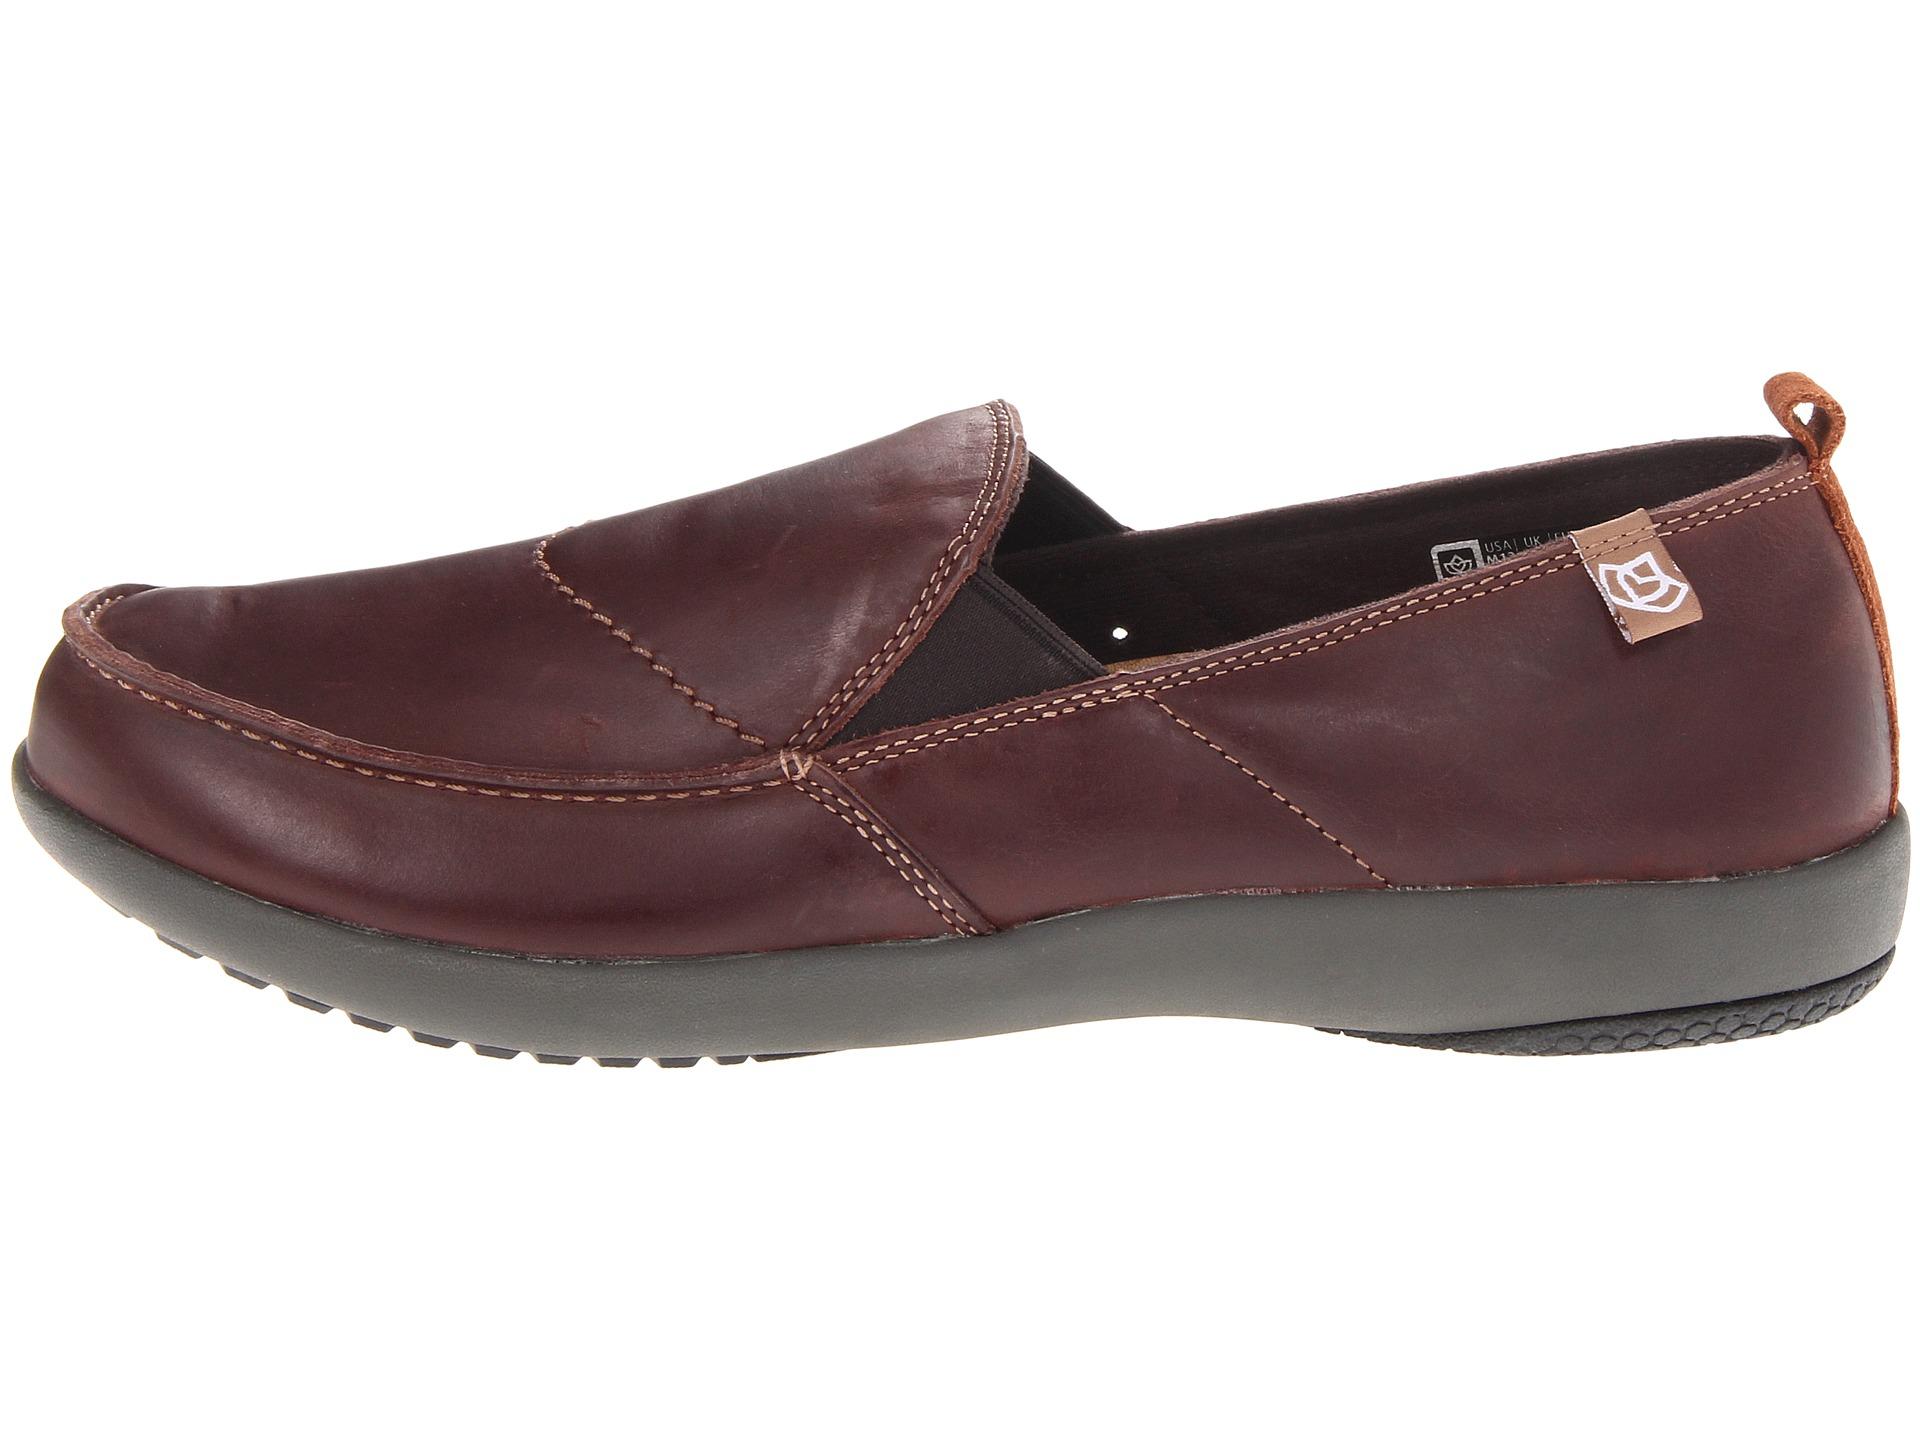 dfc1ce695b1 Lyst spenco siesta leather in brown for men jpg 1920x1440 Spenco siesta  leather